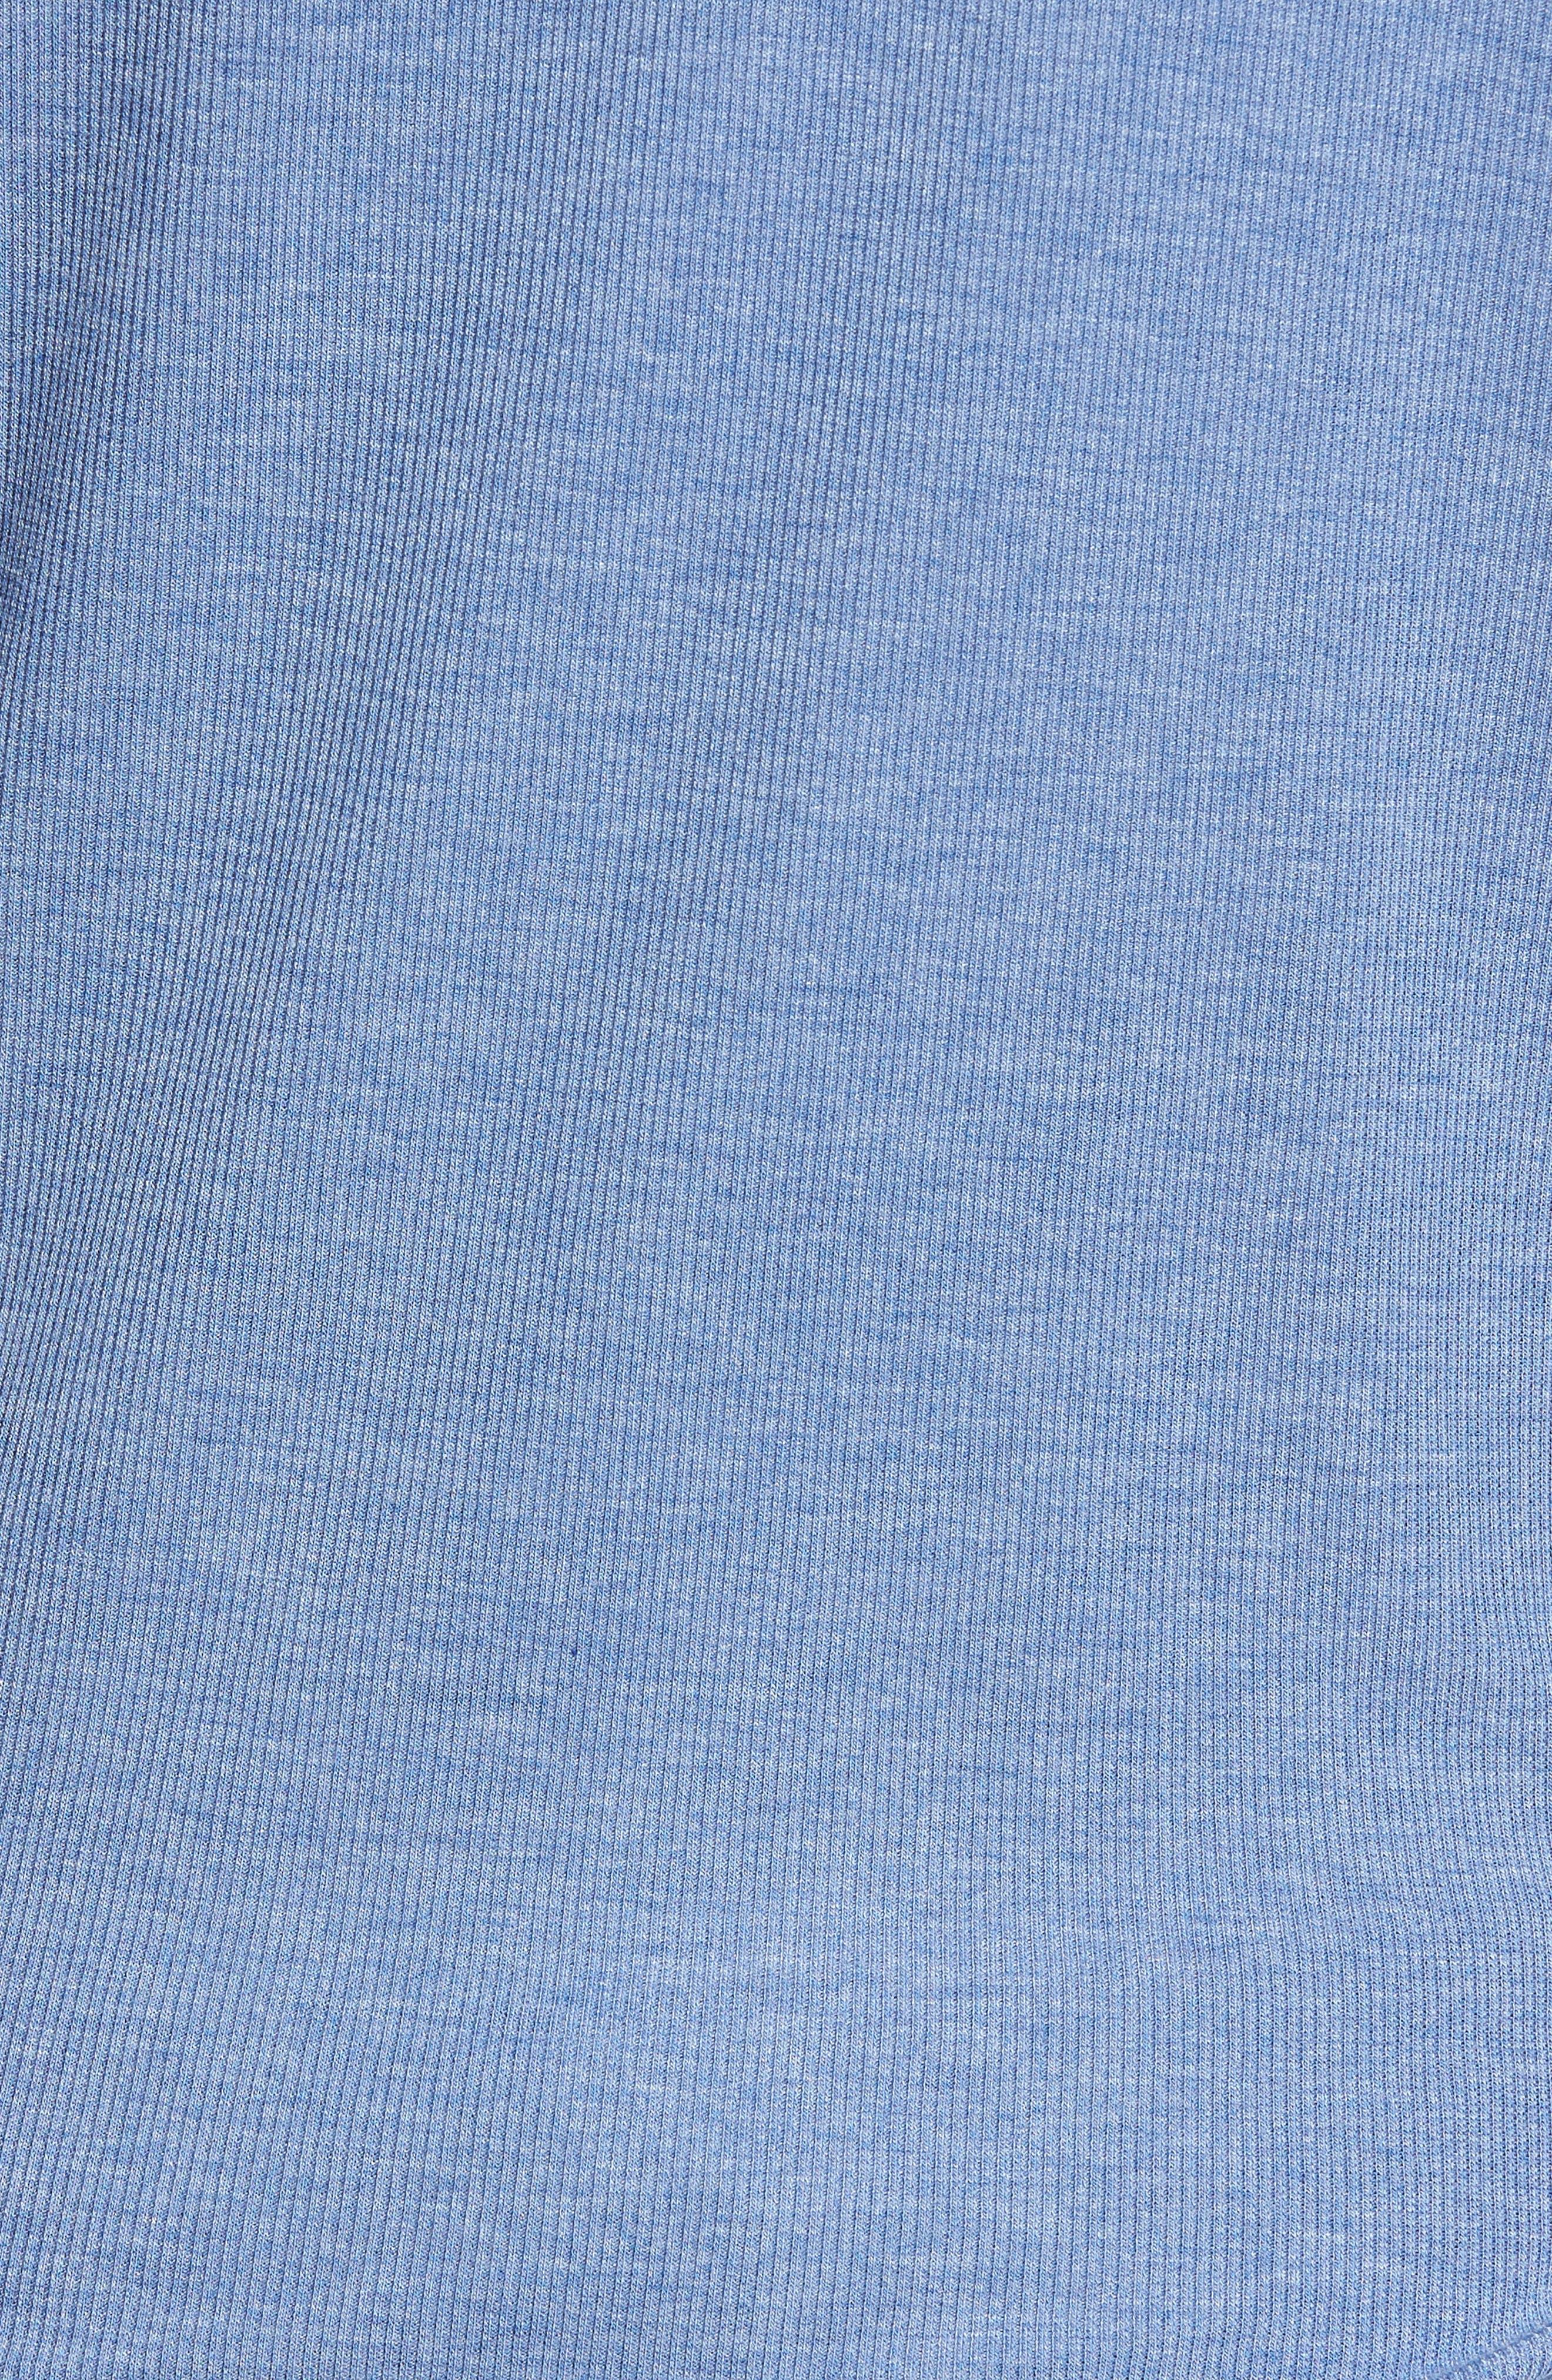 Campbell New York Mets Rib Knit Hoodie,                             Alternate thumbnail 5, color,                             Bleacher Blue